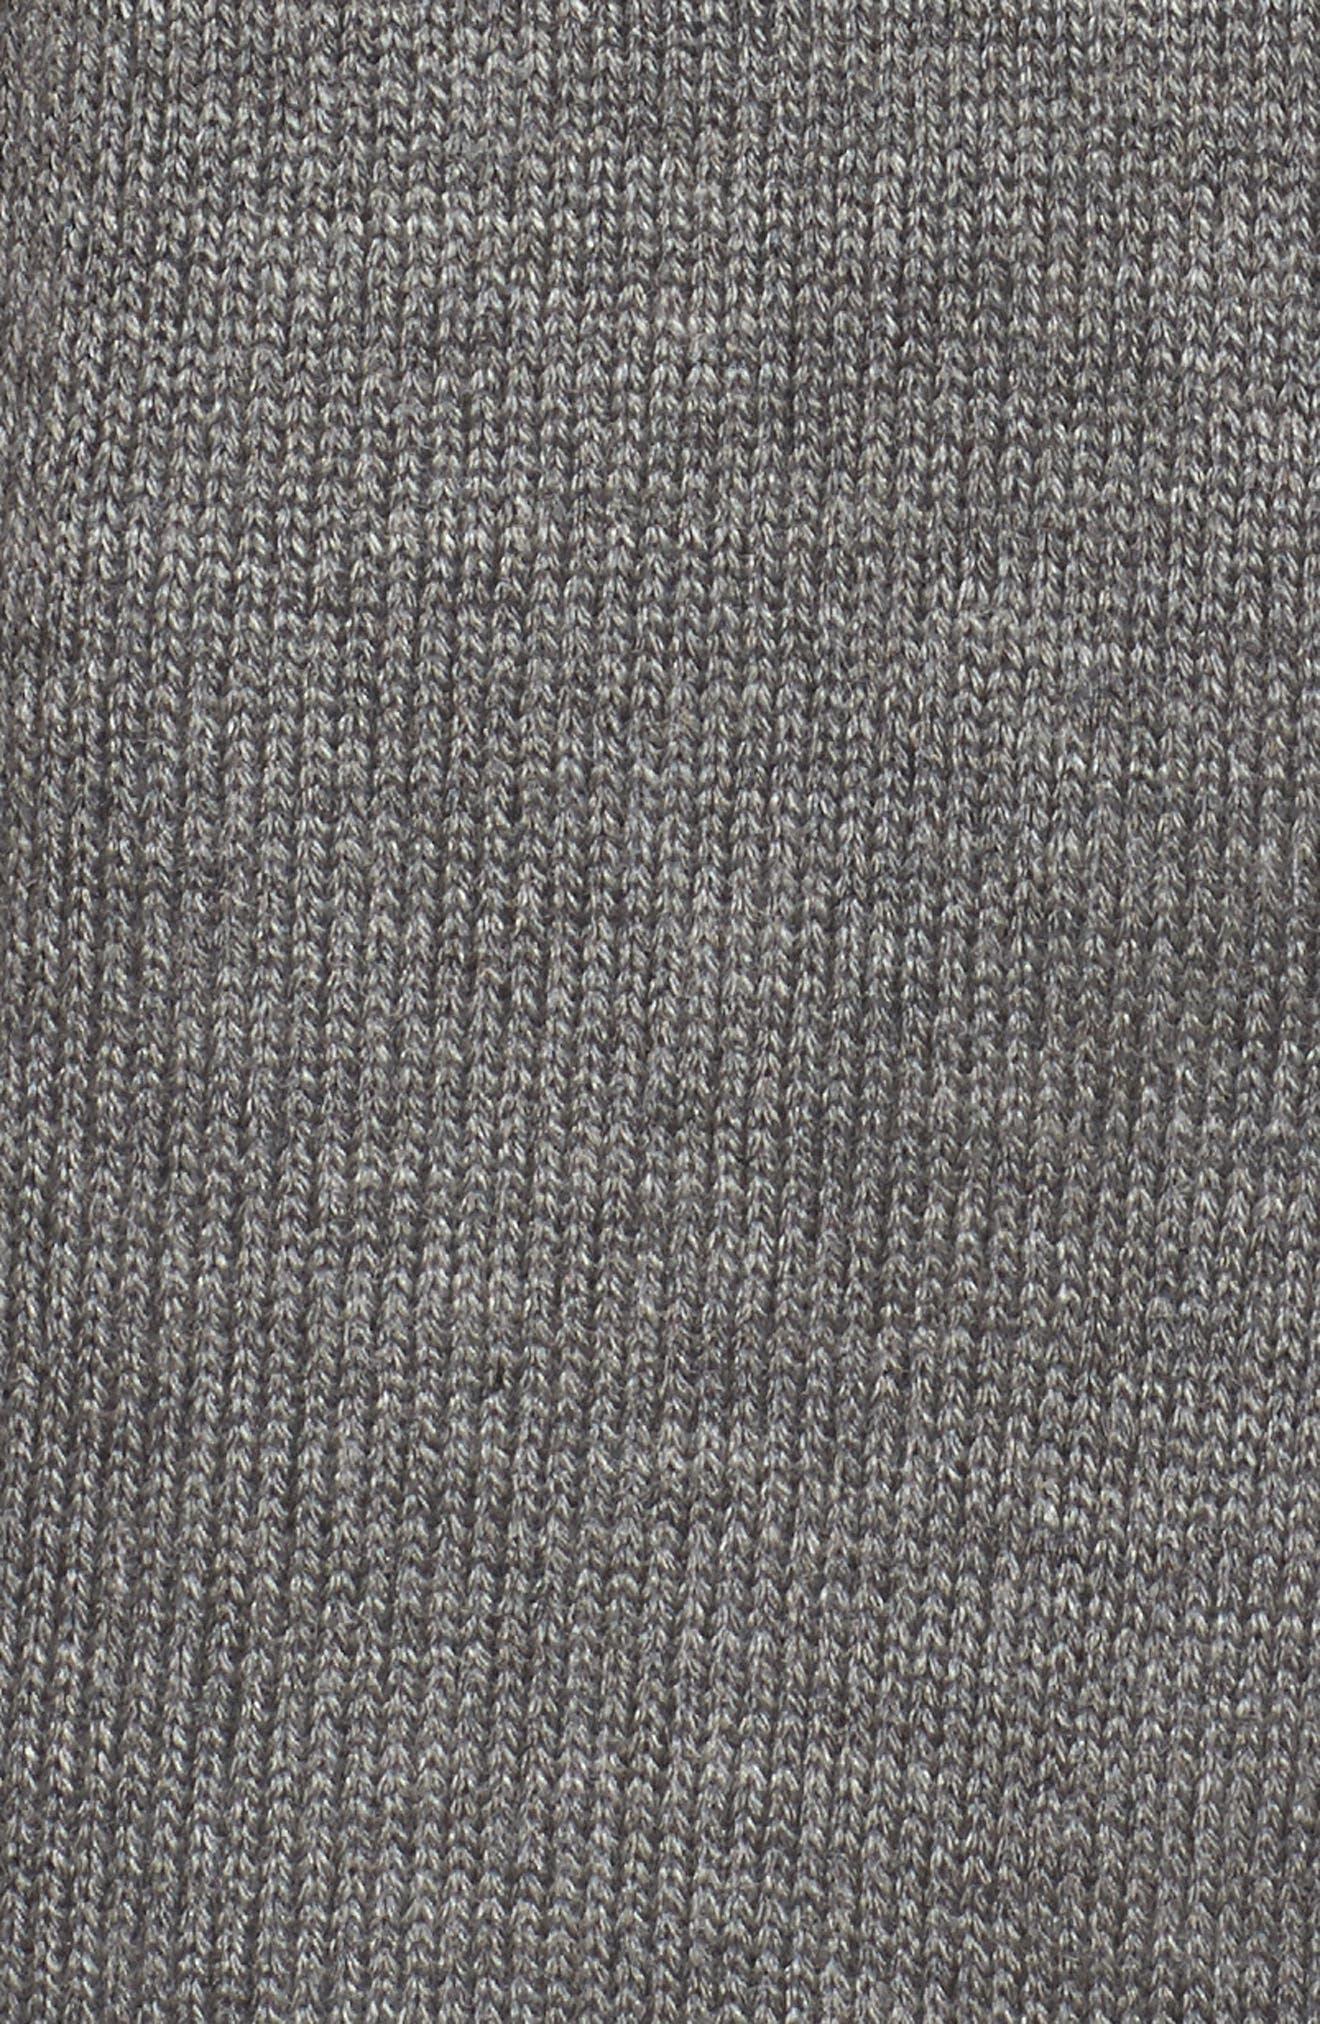 Ruffle Shoulder Cardigan,                             Alternate thumbnail 5, color,                             Grey